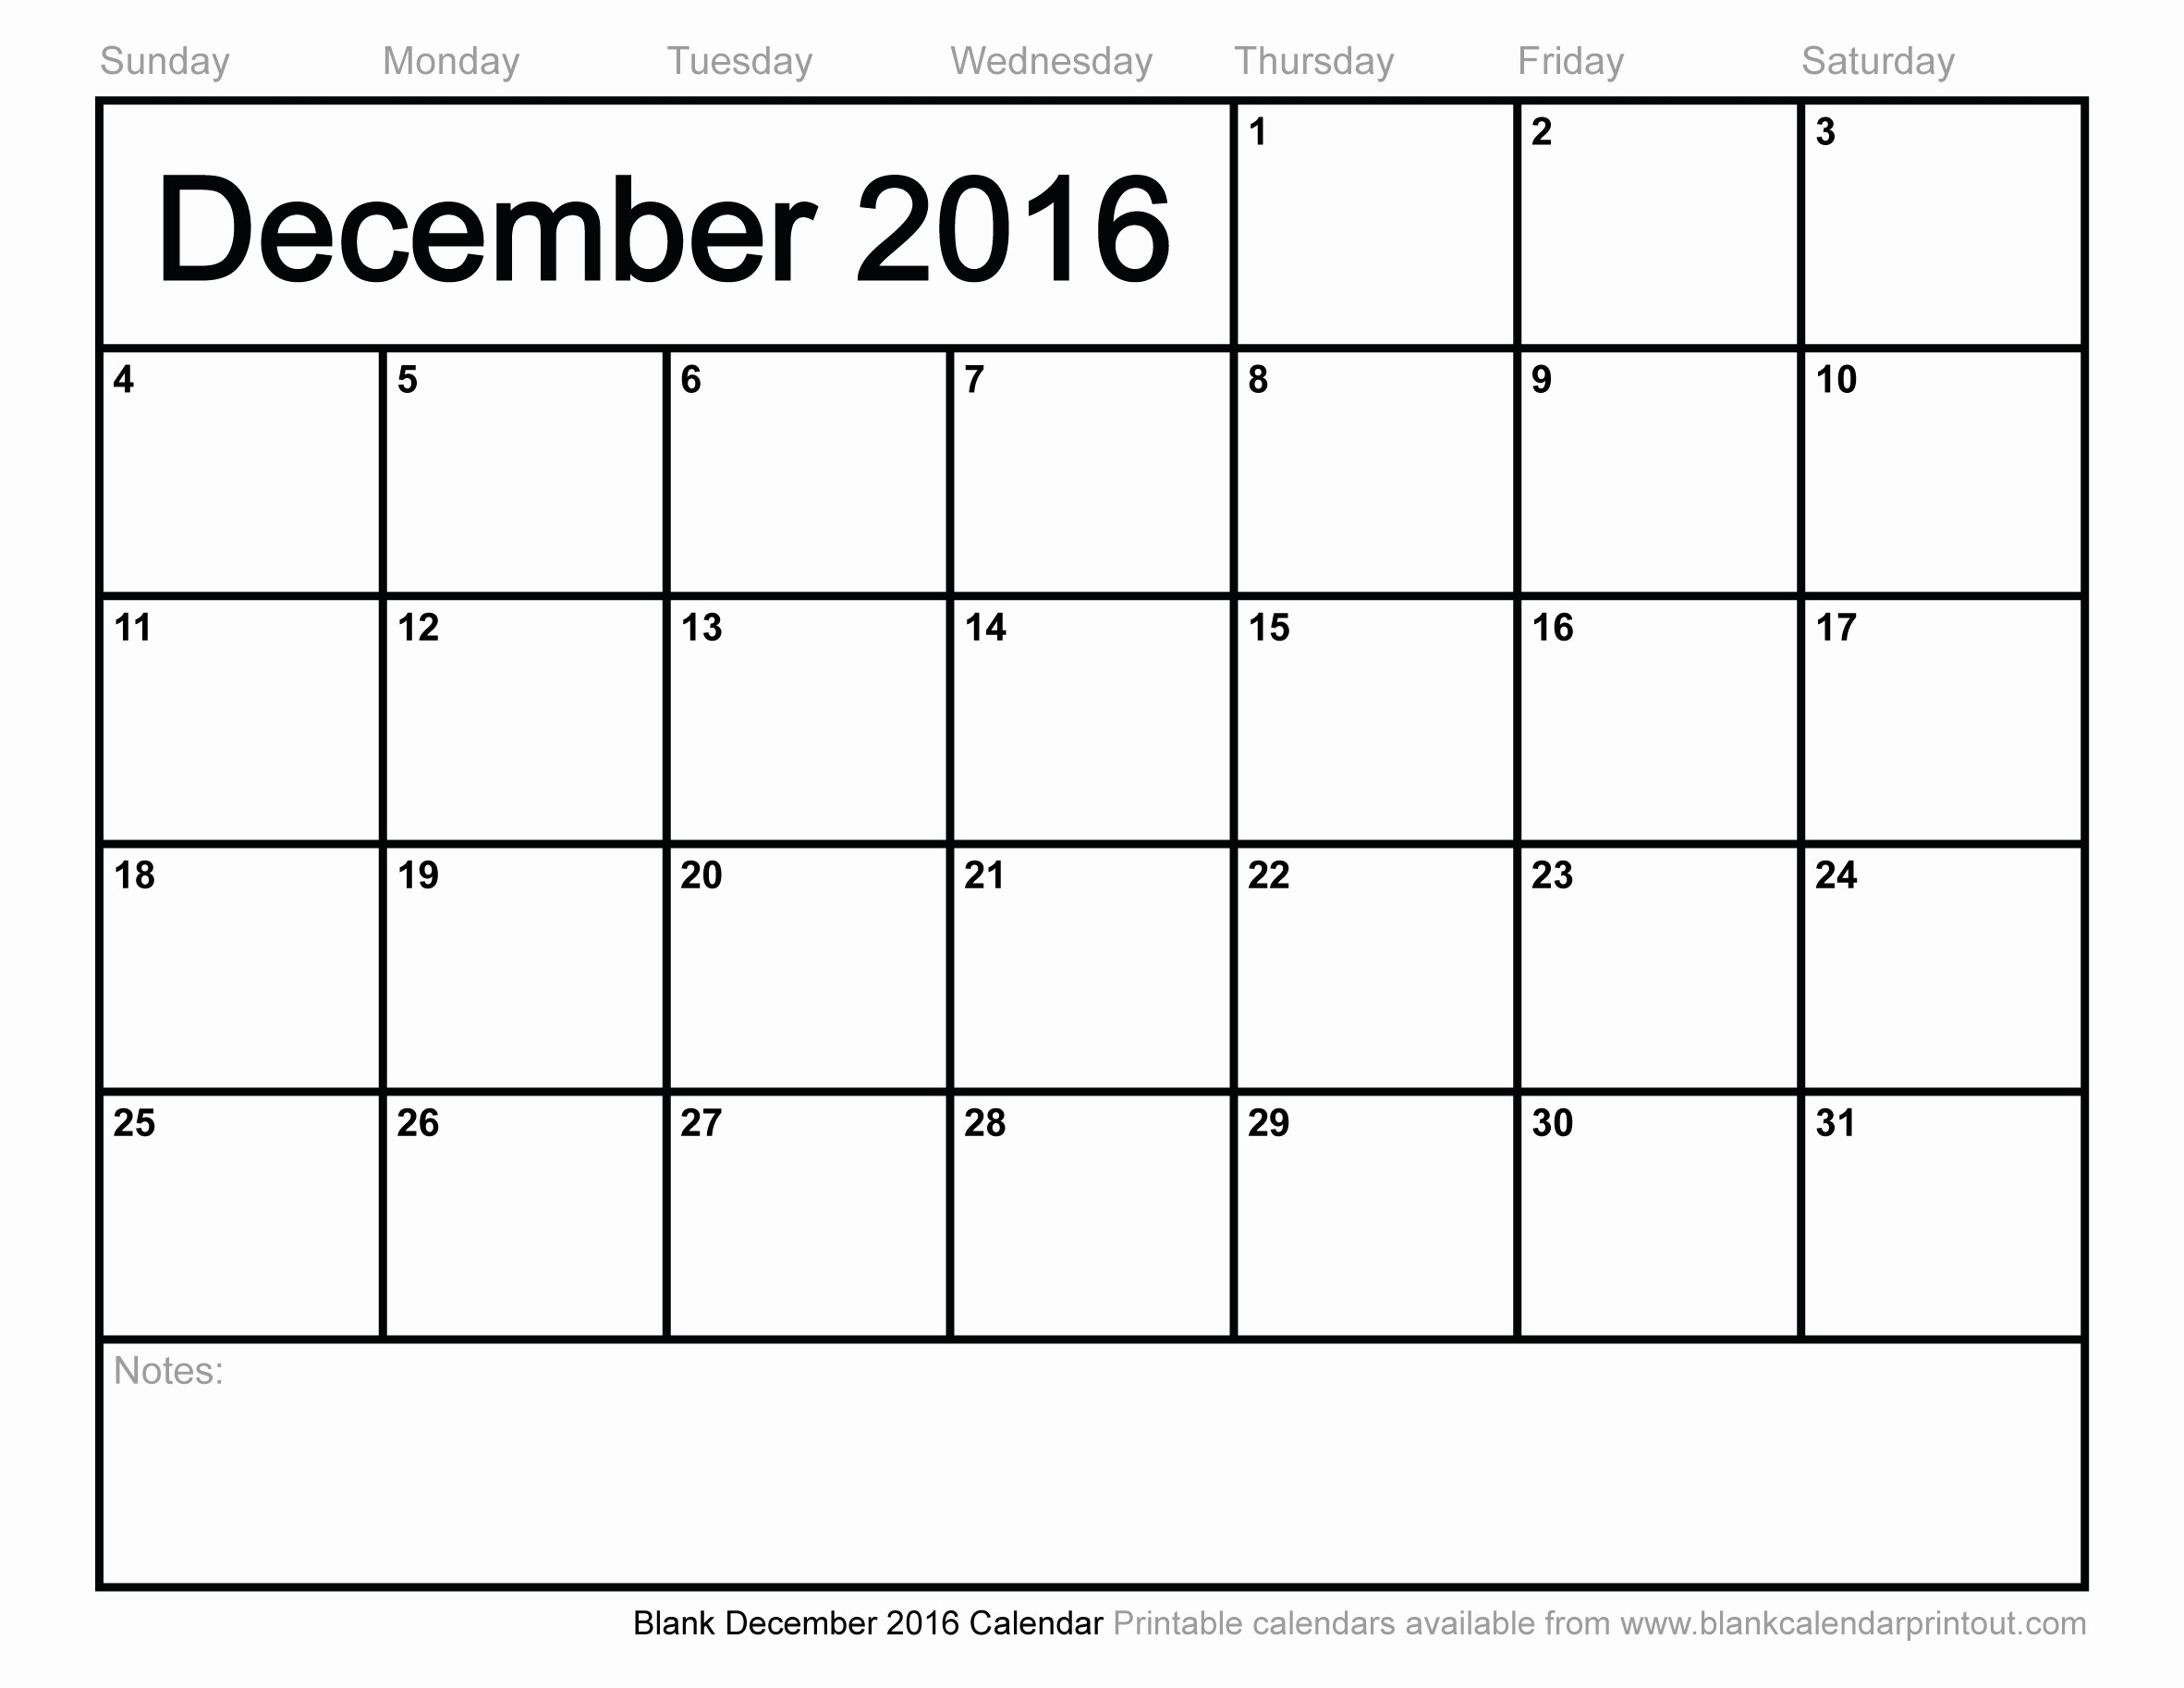 Blank December Calendar 2016 Printable Best Of Blank December 2016 Calendar to Print